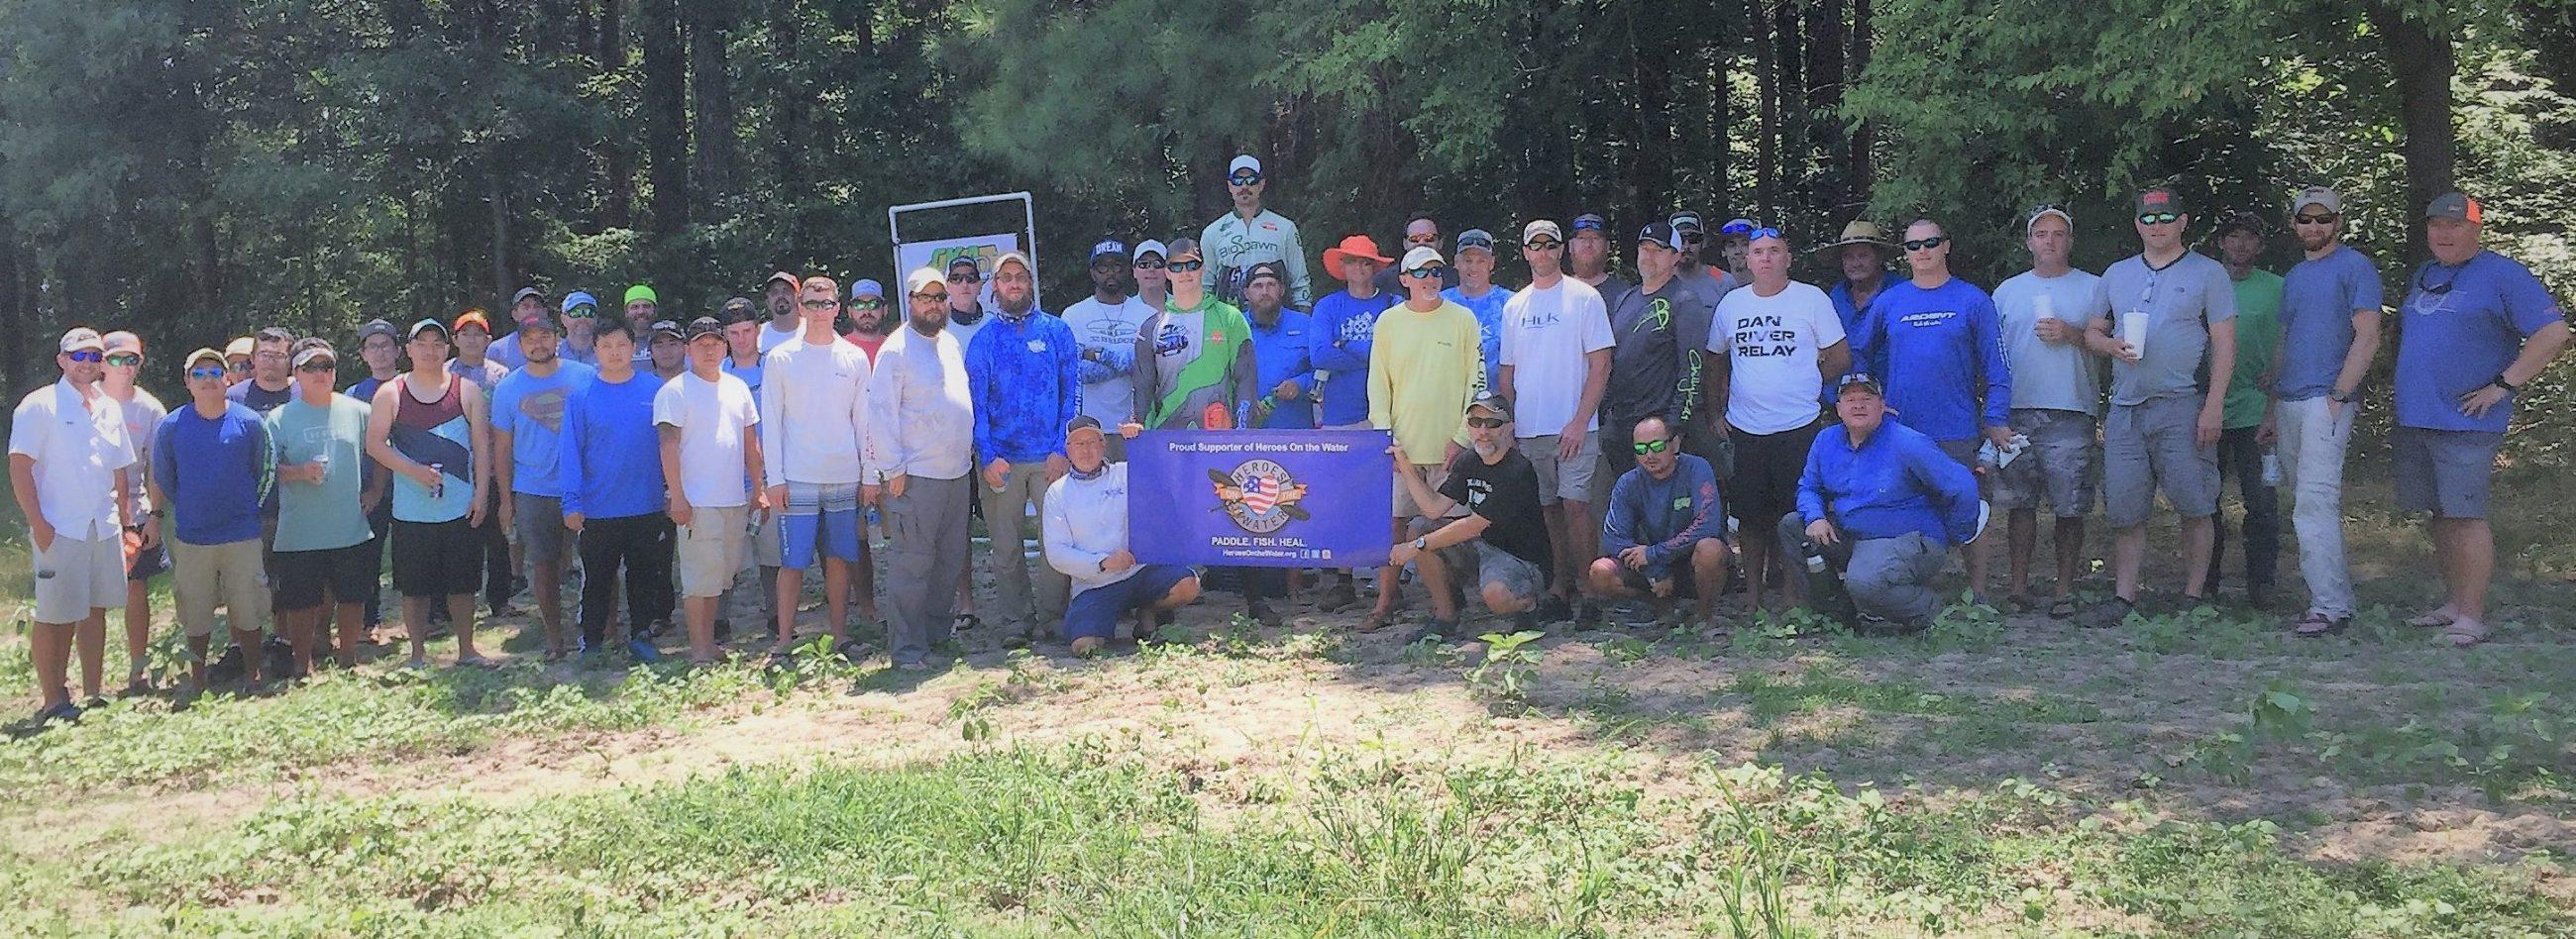 Carolina Kayak Anglers – The Premier NC Kayak Fishing Tournament Series